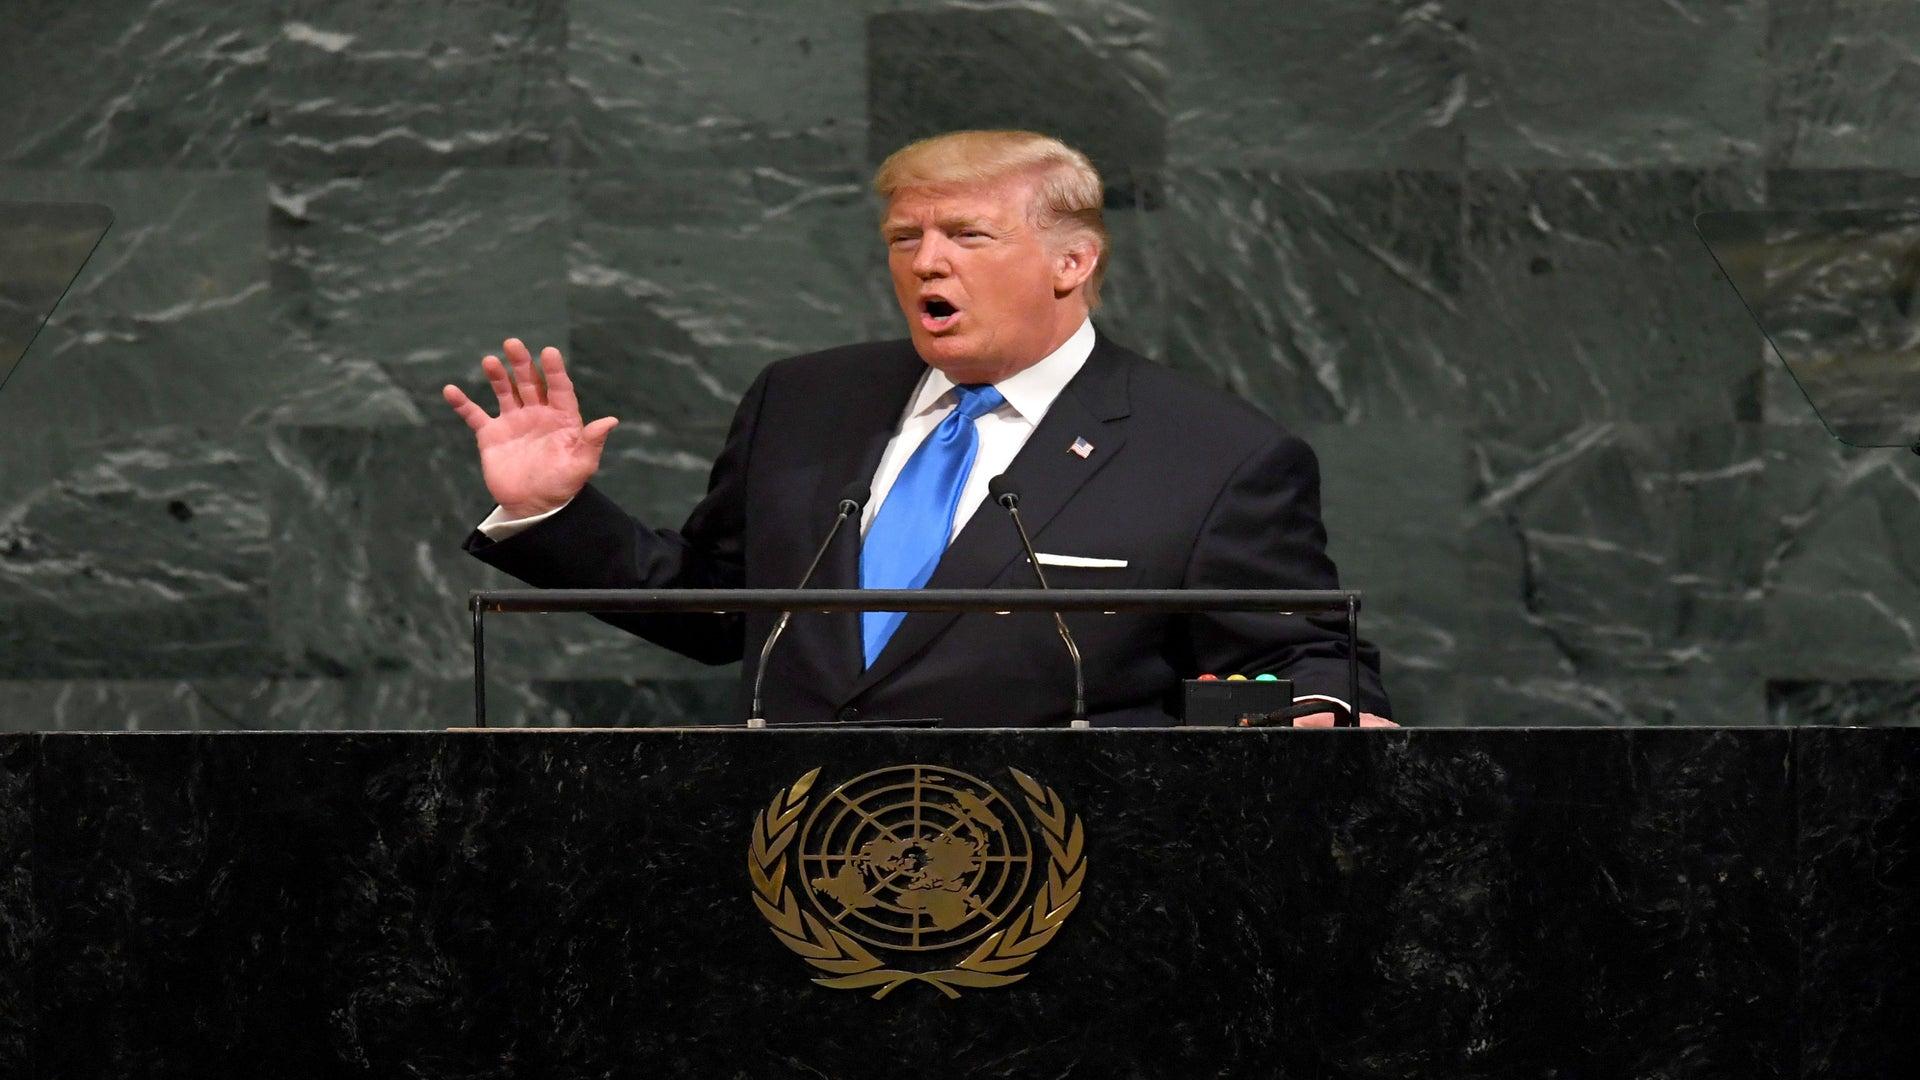 President Trump Threatens To 'Totally Destroy' North Korea In U.N. Speech